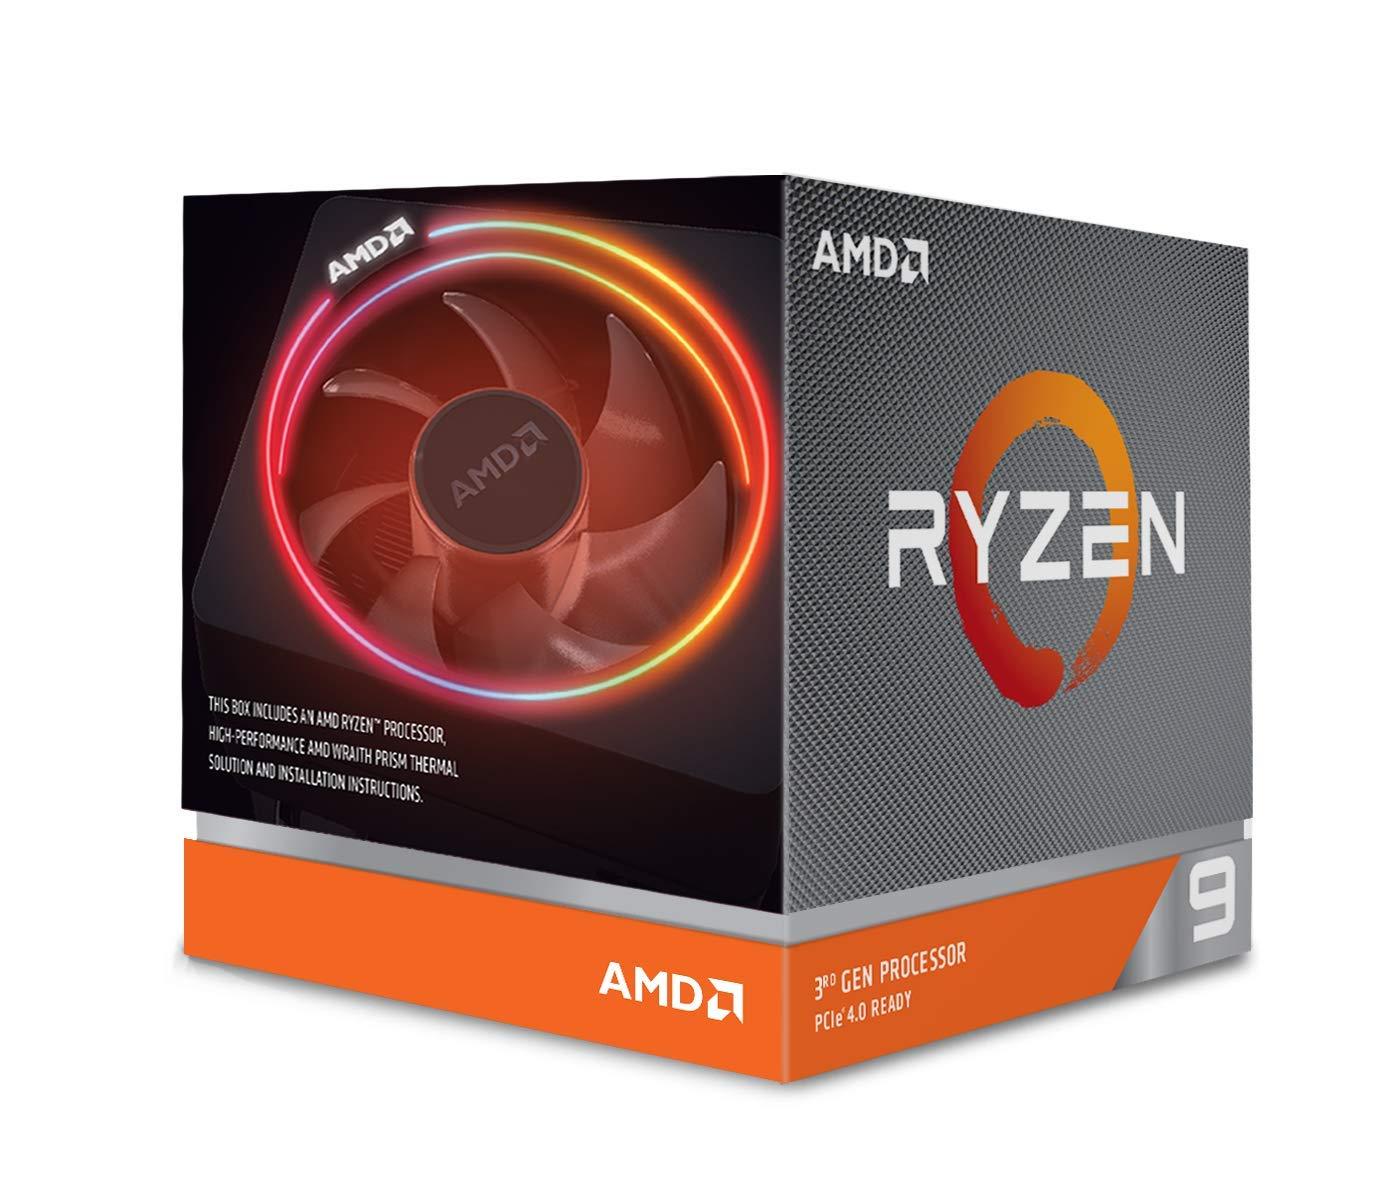 AMD Ryzen 9 3900X Processor (12C/24T, 70MB Cache, 4.6 GHz Max Boost) £450 @ Amazon